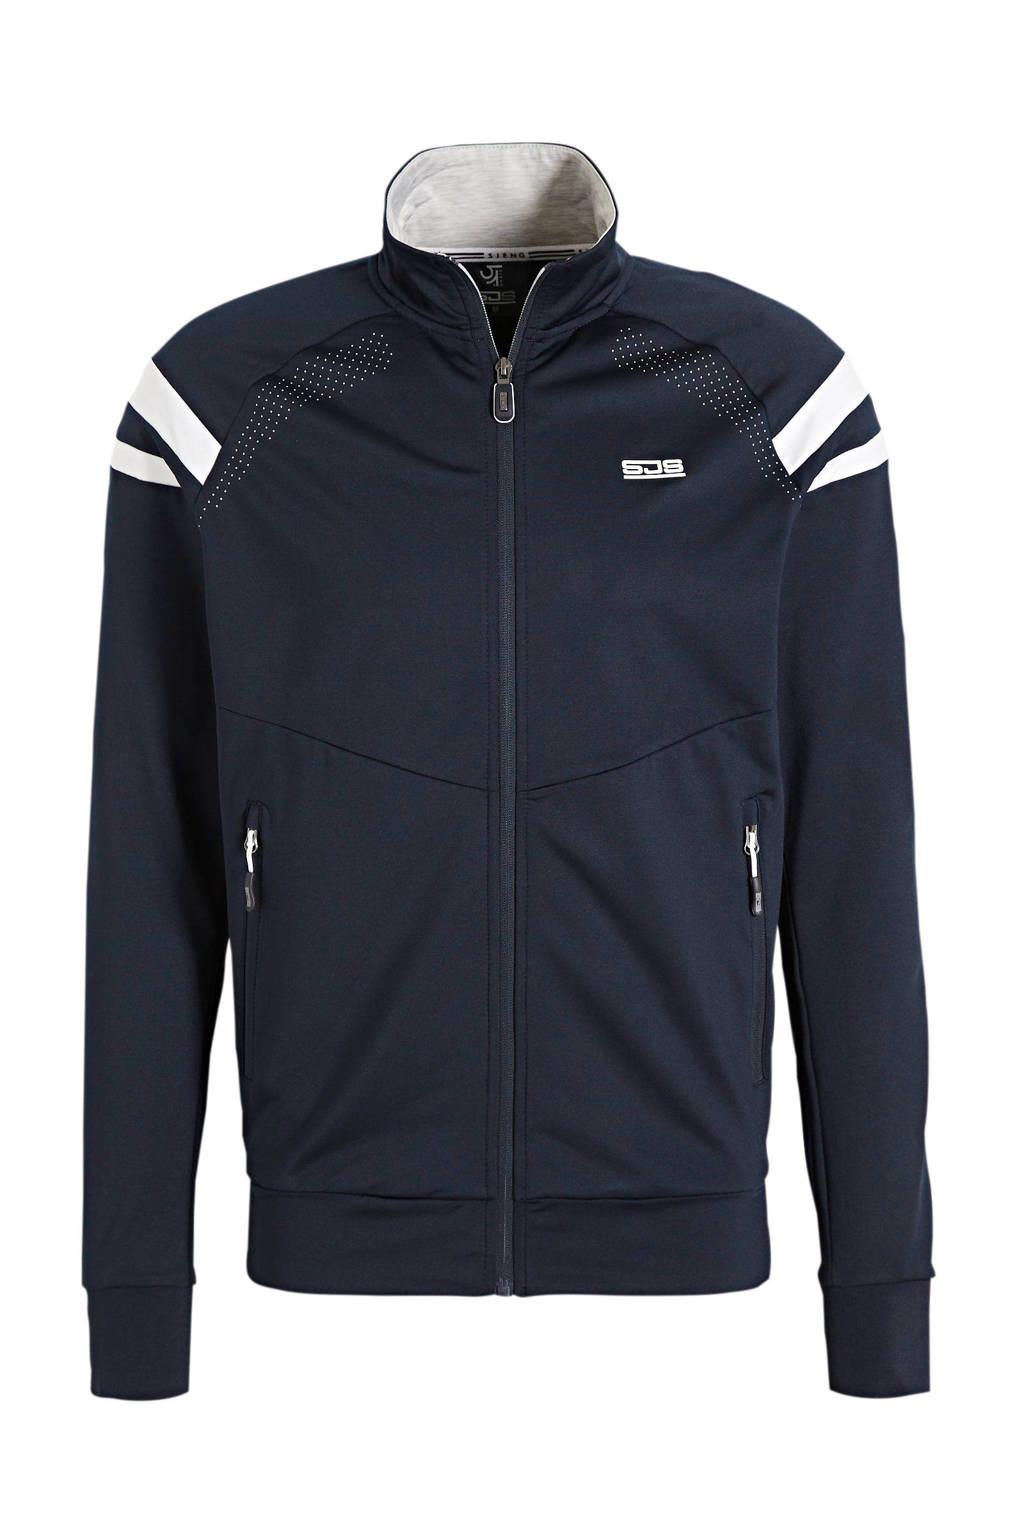 Sjeng Sports   vest donkerblauw/wit, Donkerblauw/wit